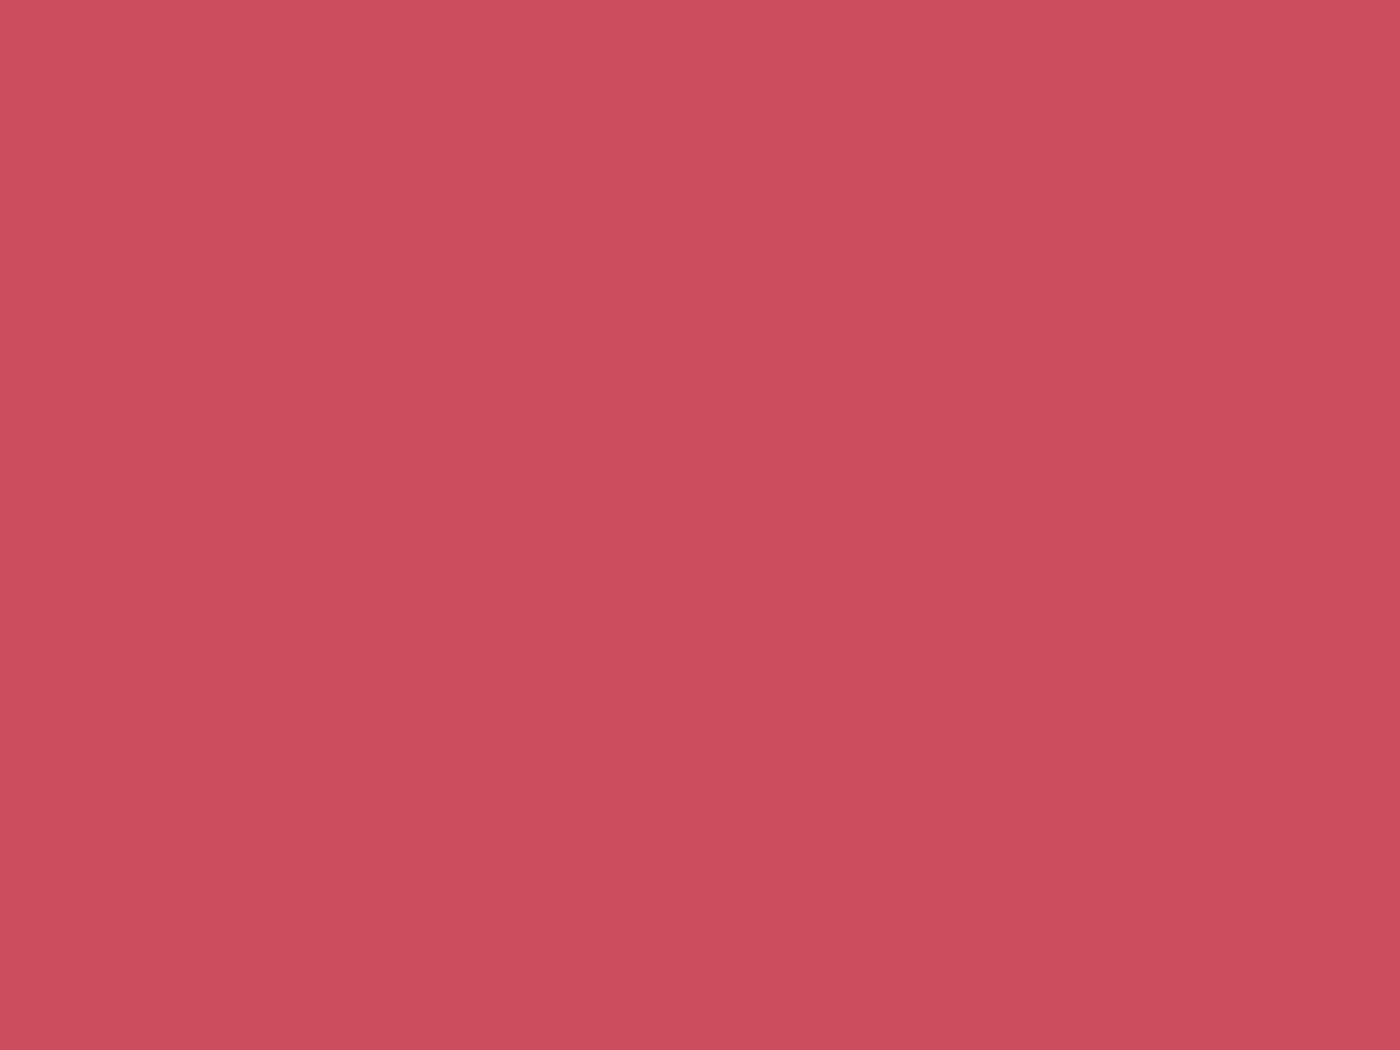 1400x1050 Dark Terra Cotta Solid Color Background